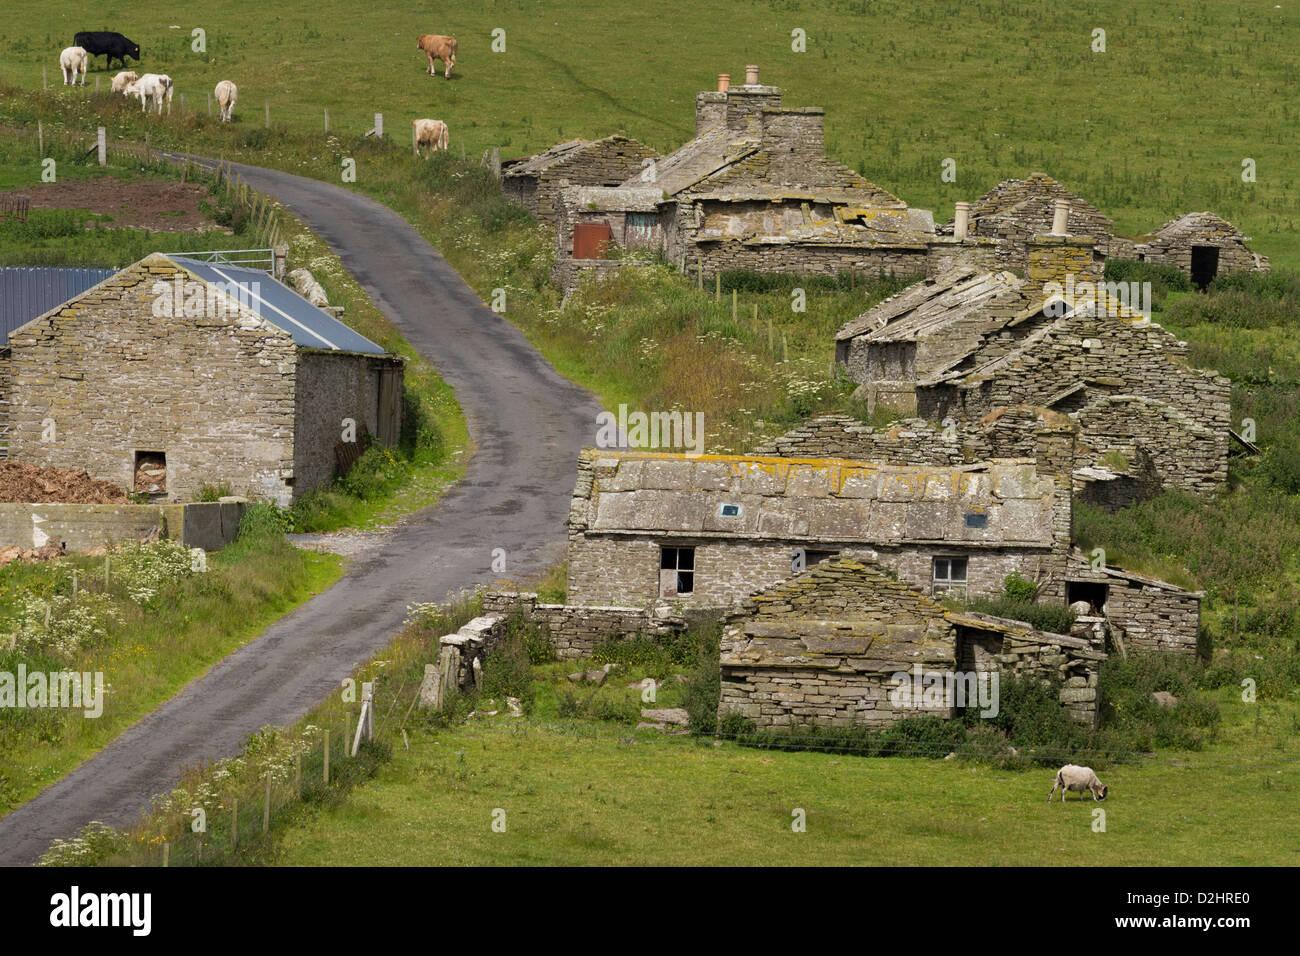 Abandoned village, Orkney Islands - Stock Image